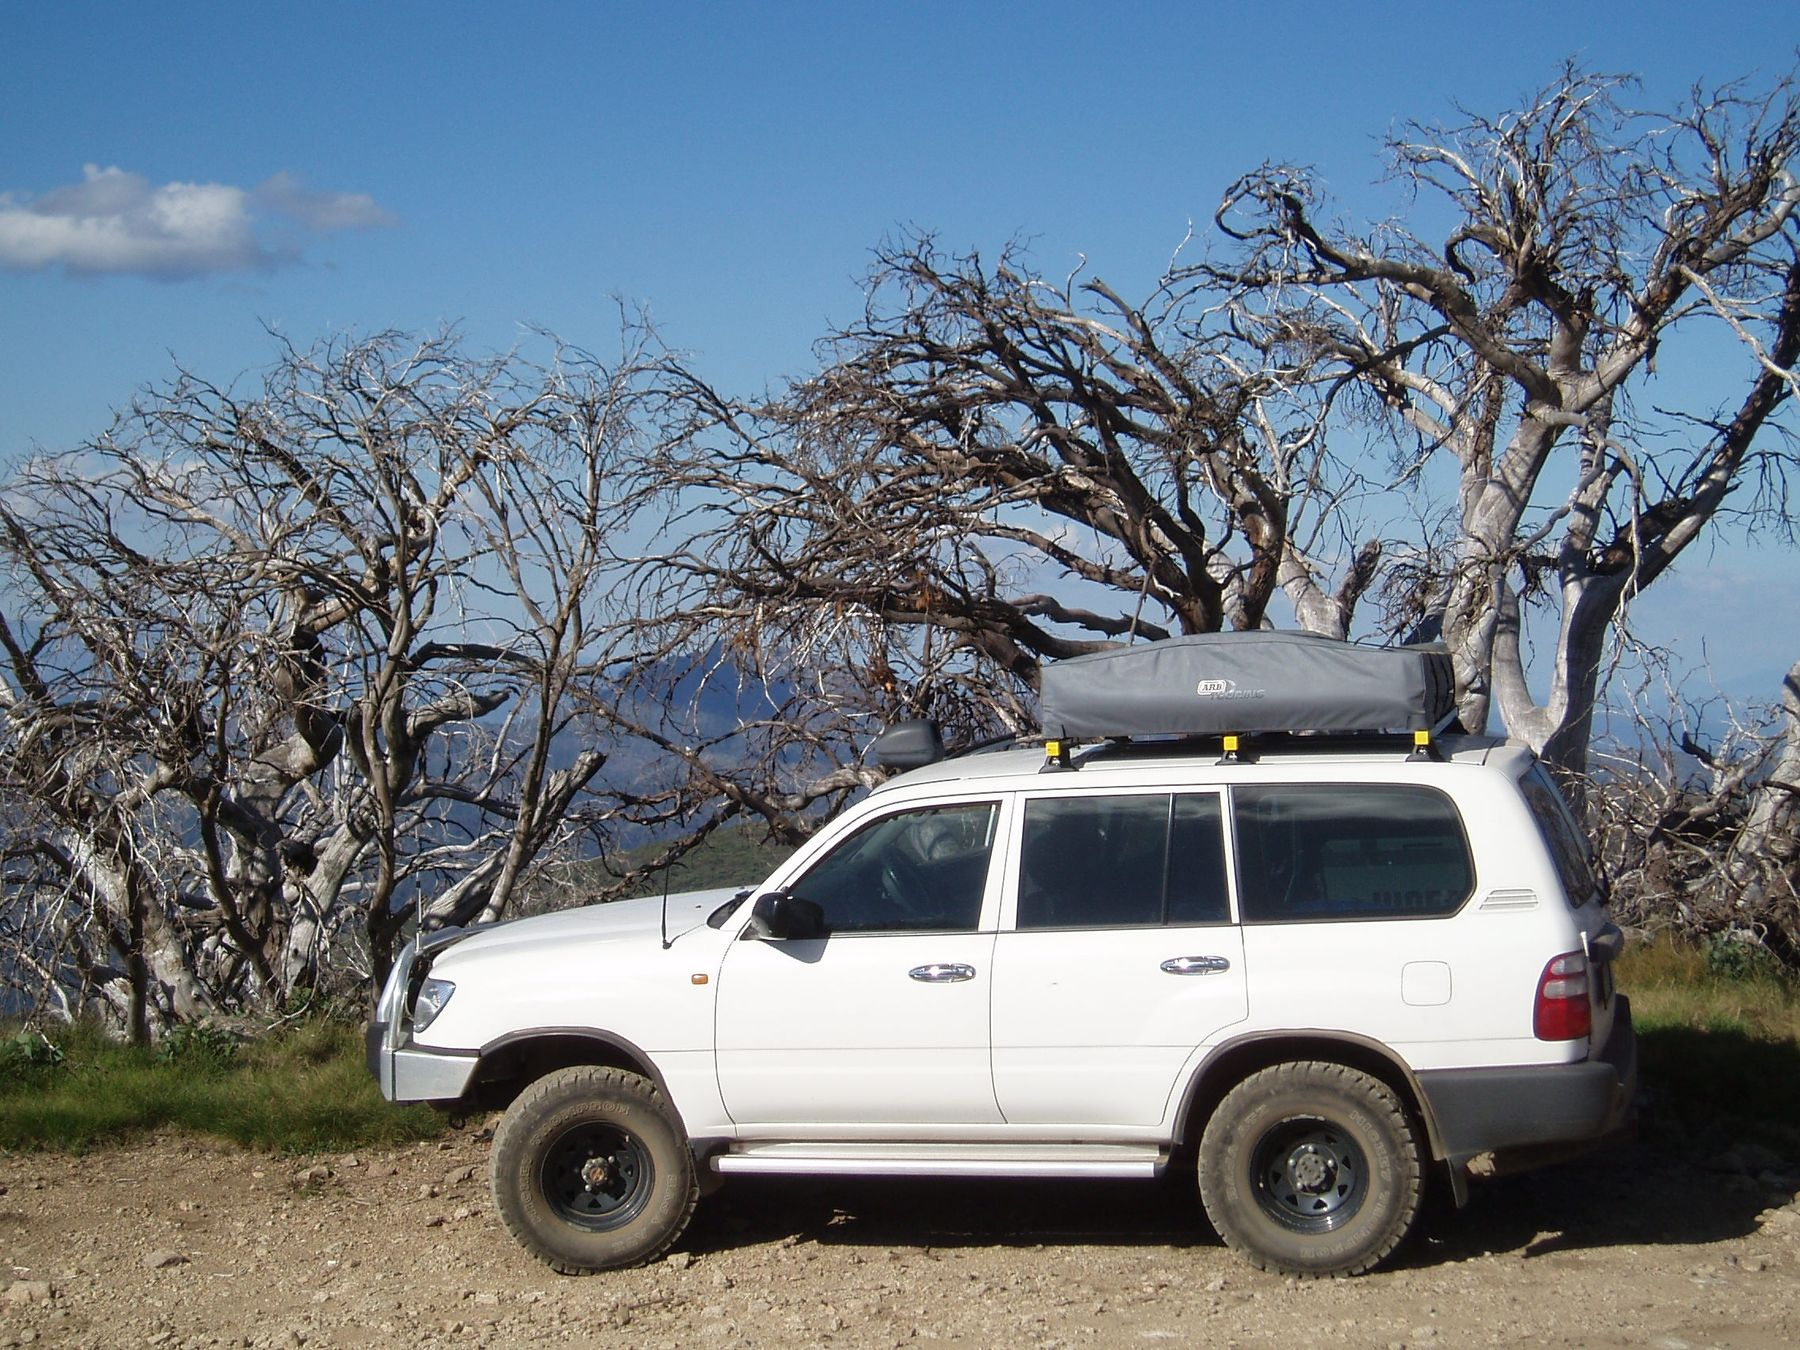 Australian road trip vehicle, Victorian Alps